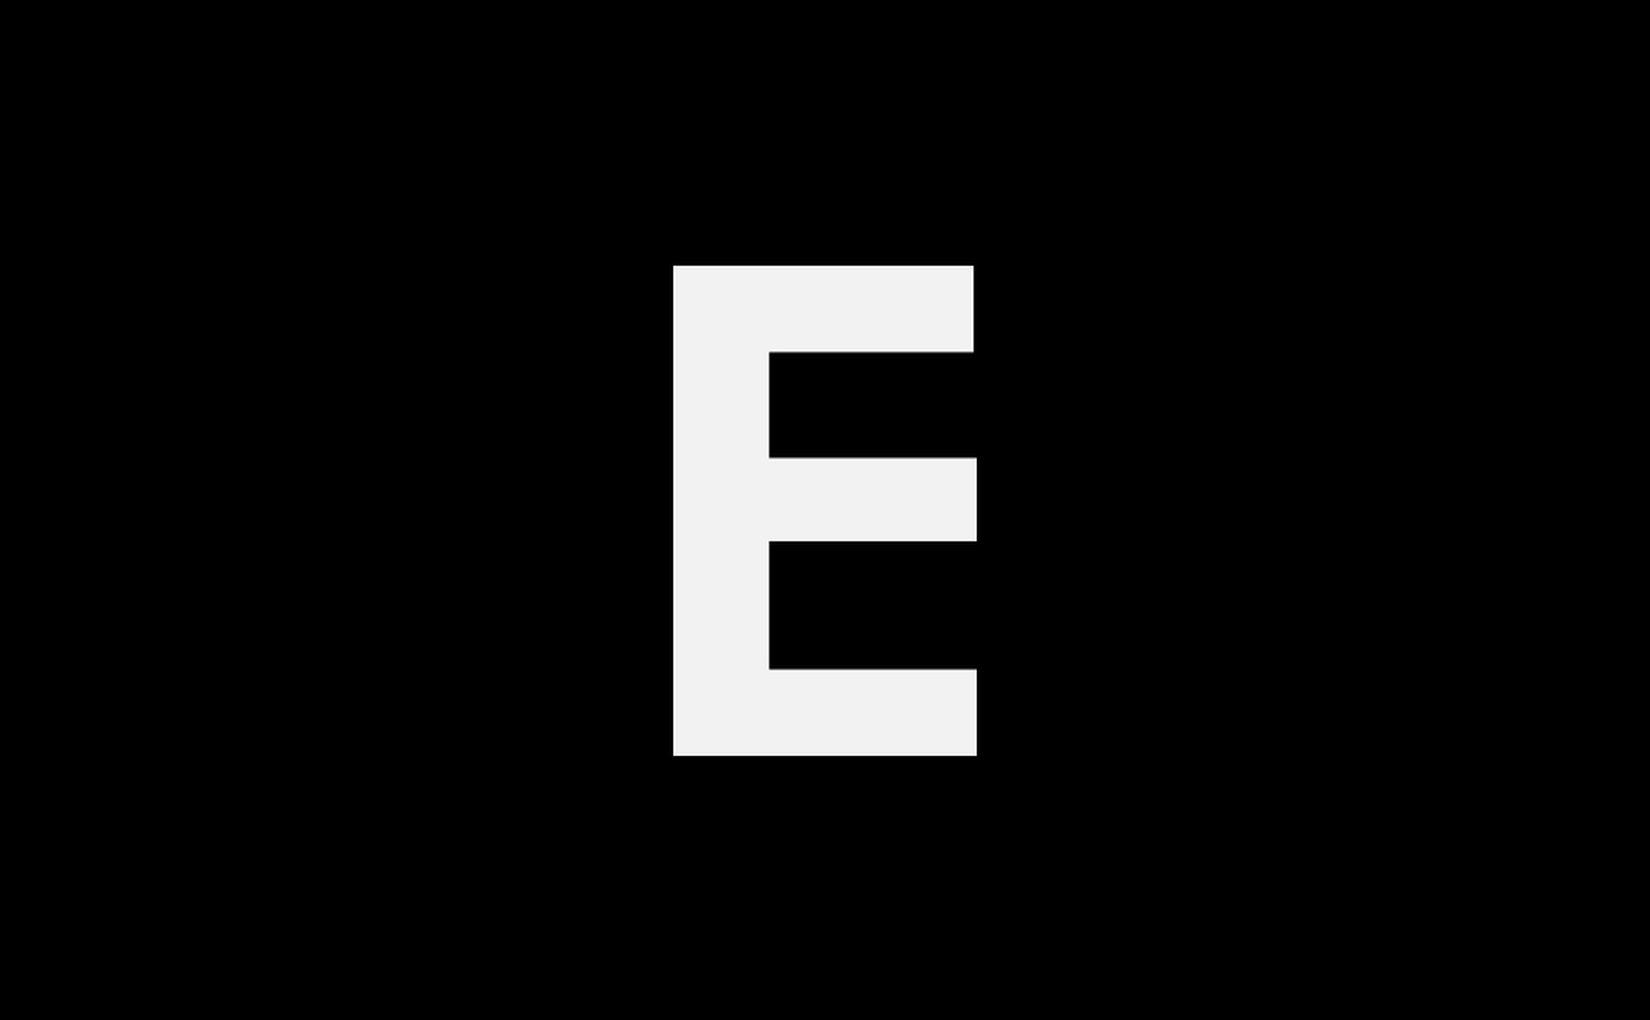 which version you need, i have them all! all released versions of the eyeem app for android! 😂 Samsung G850F Alpha CC-BY-NC-SA Bielefeld Bielefeldcity Bielefelderosten Senseless Senselessthings Senseless As Fuck! Never Mind.. 😚 EyeEm Eyeemplus EyeEm+ HckEm CrkEm EyeMod Pixelated Technology Internet Cyberspace Data Close-up